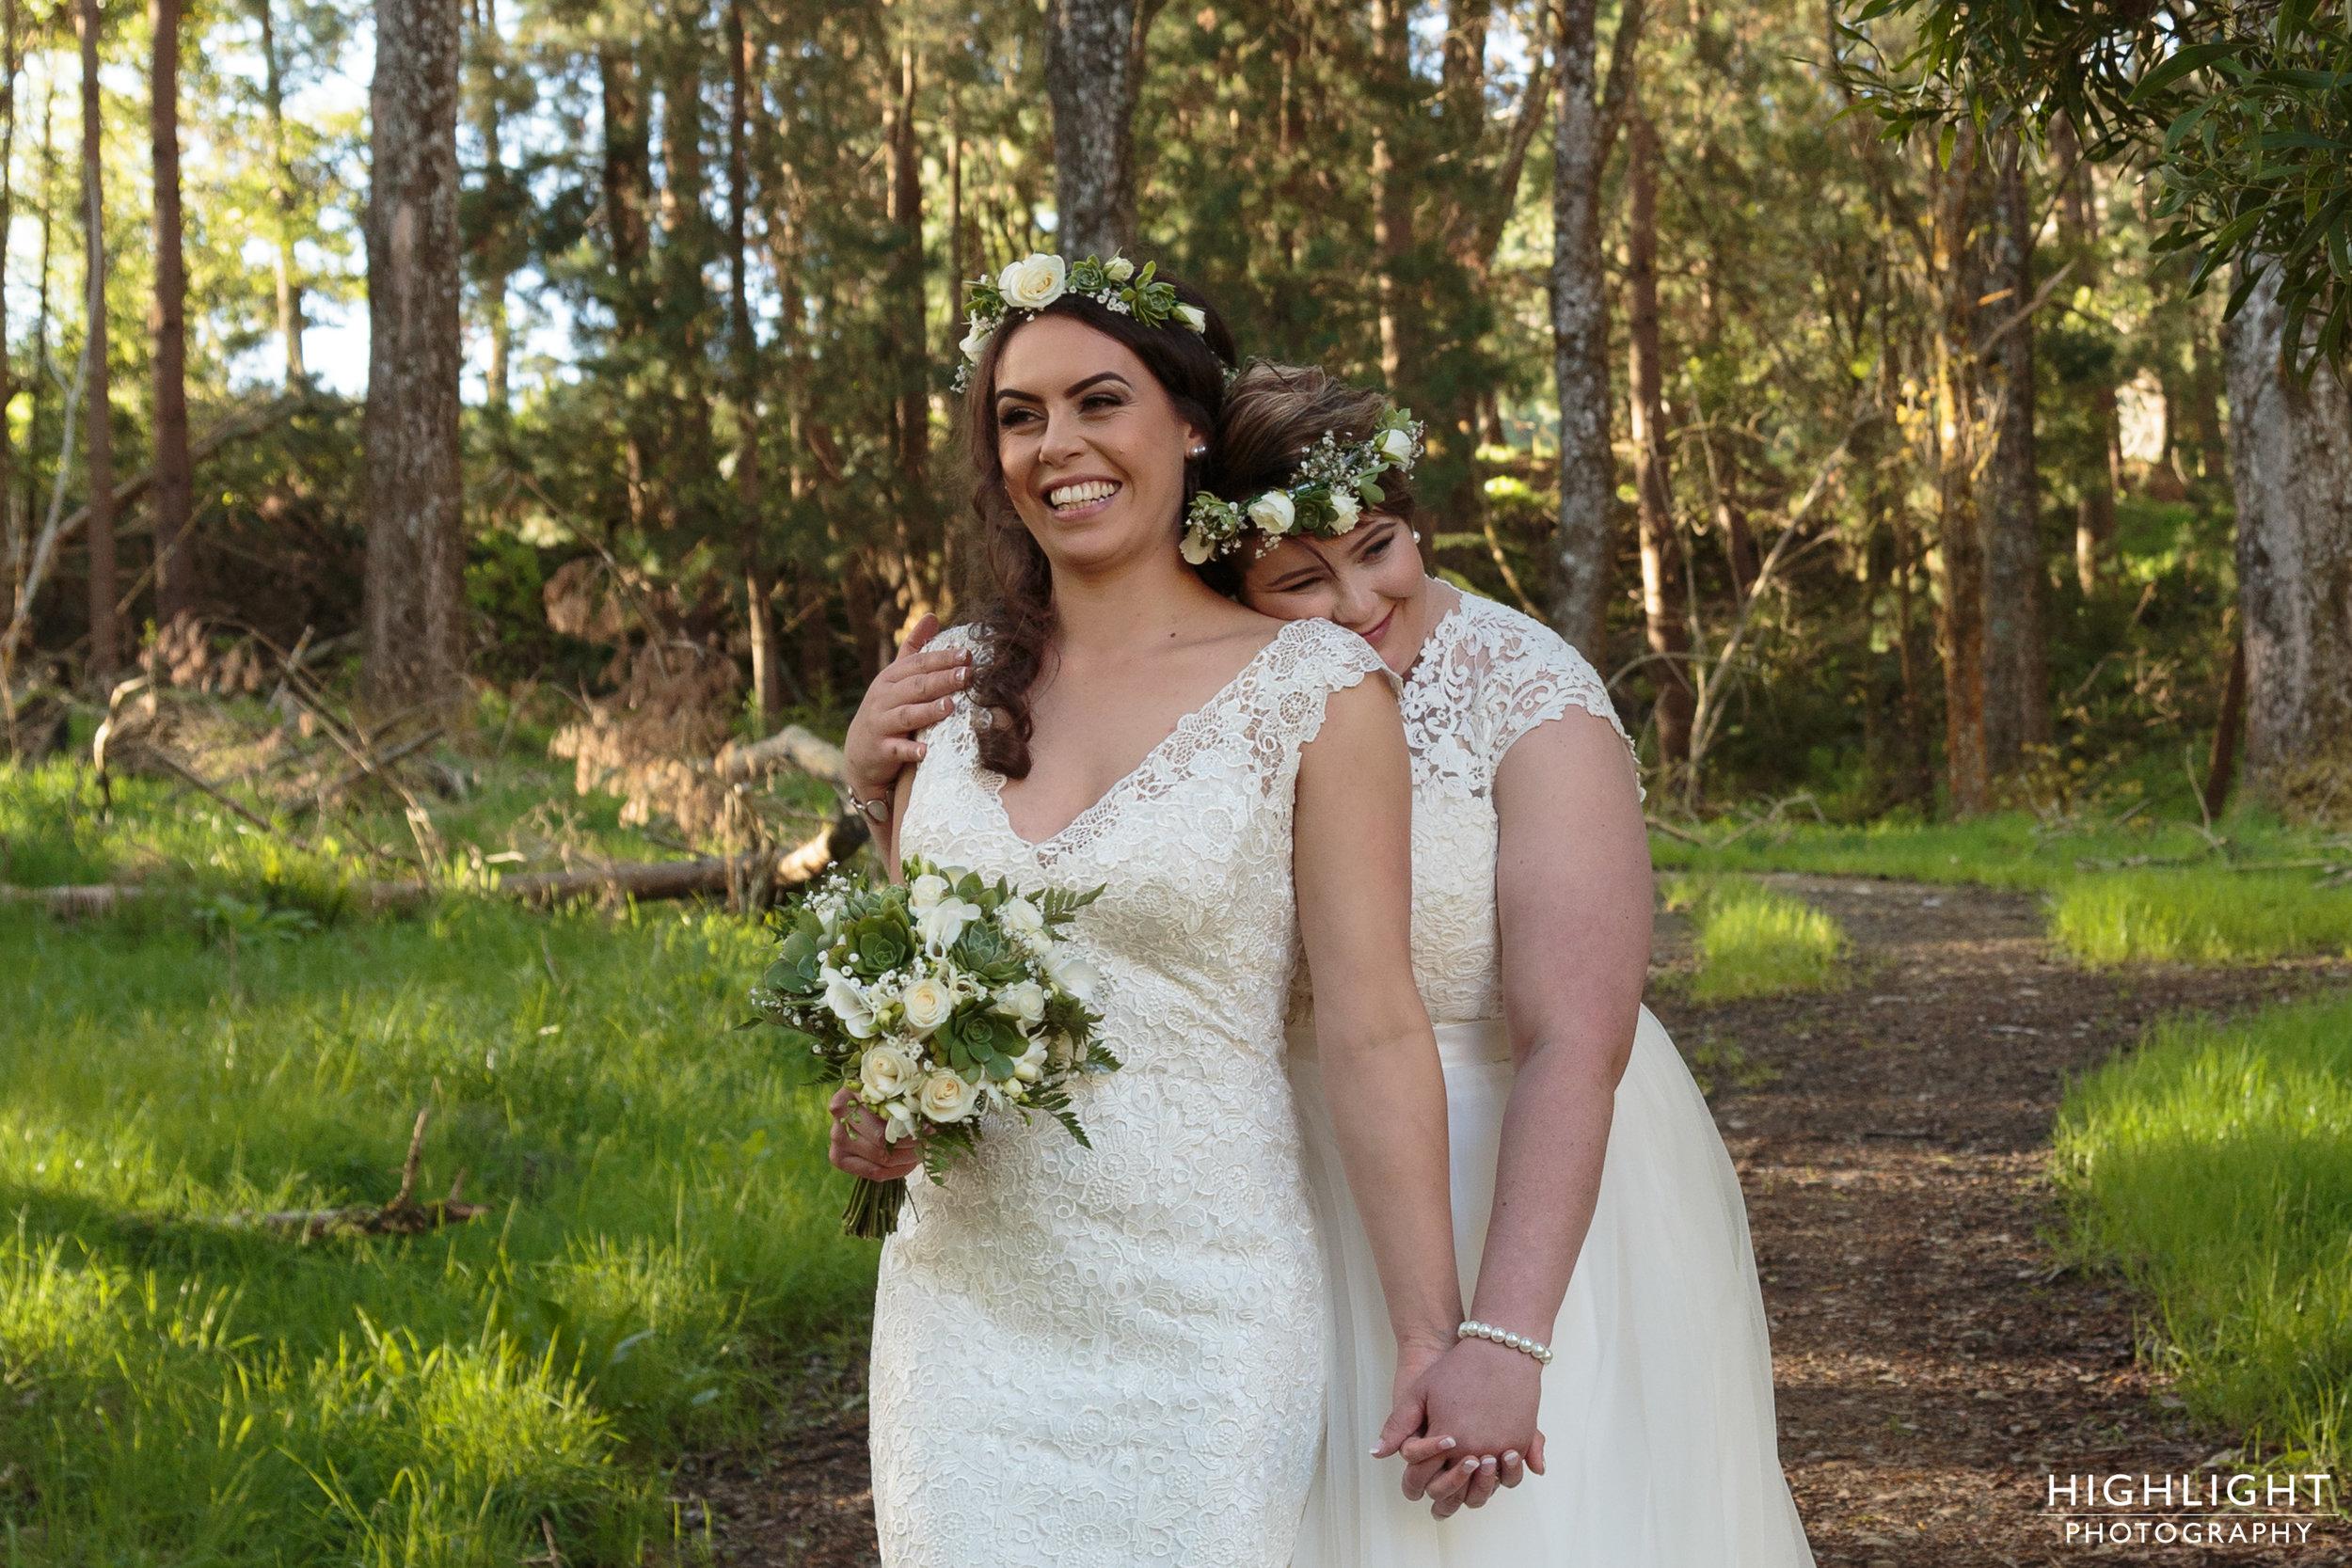 highlight_wedding_photography_makoura_lodge_manawatu_new_zealand-125.jpg